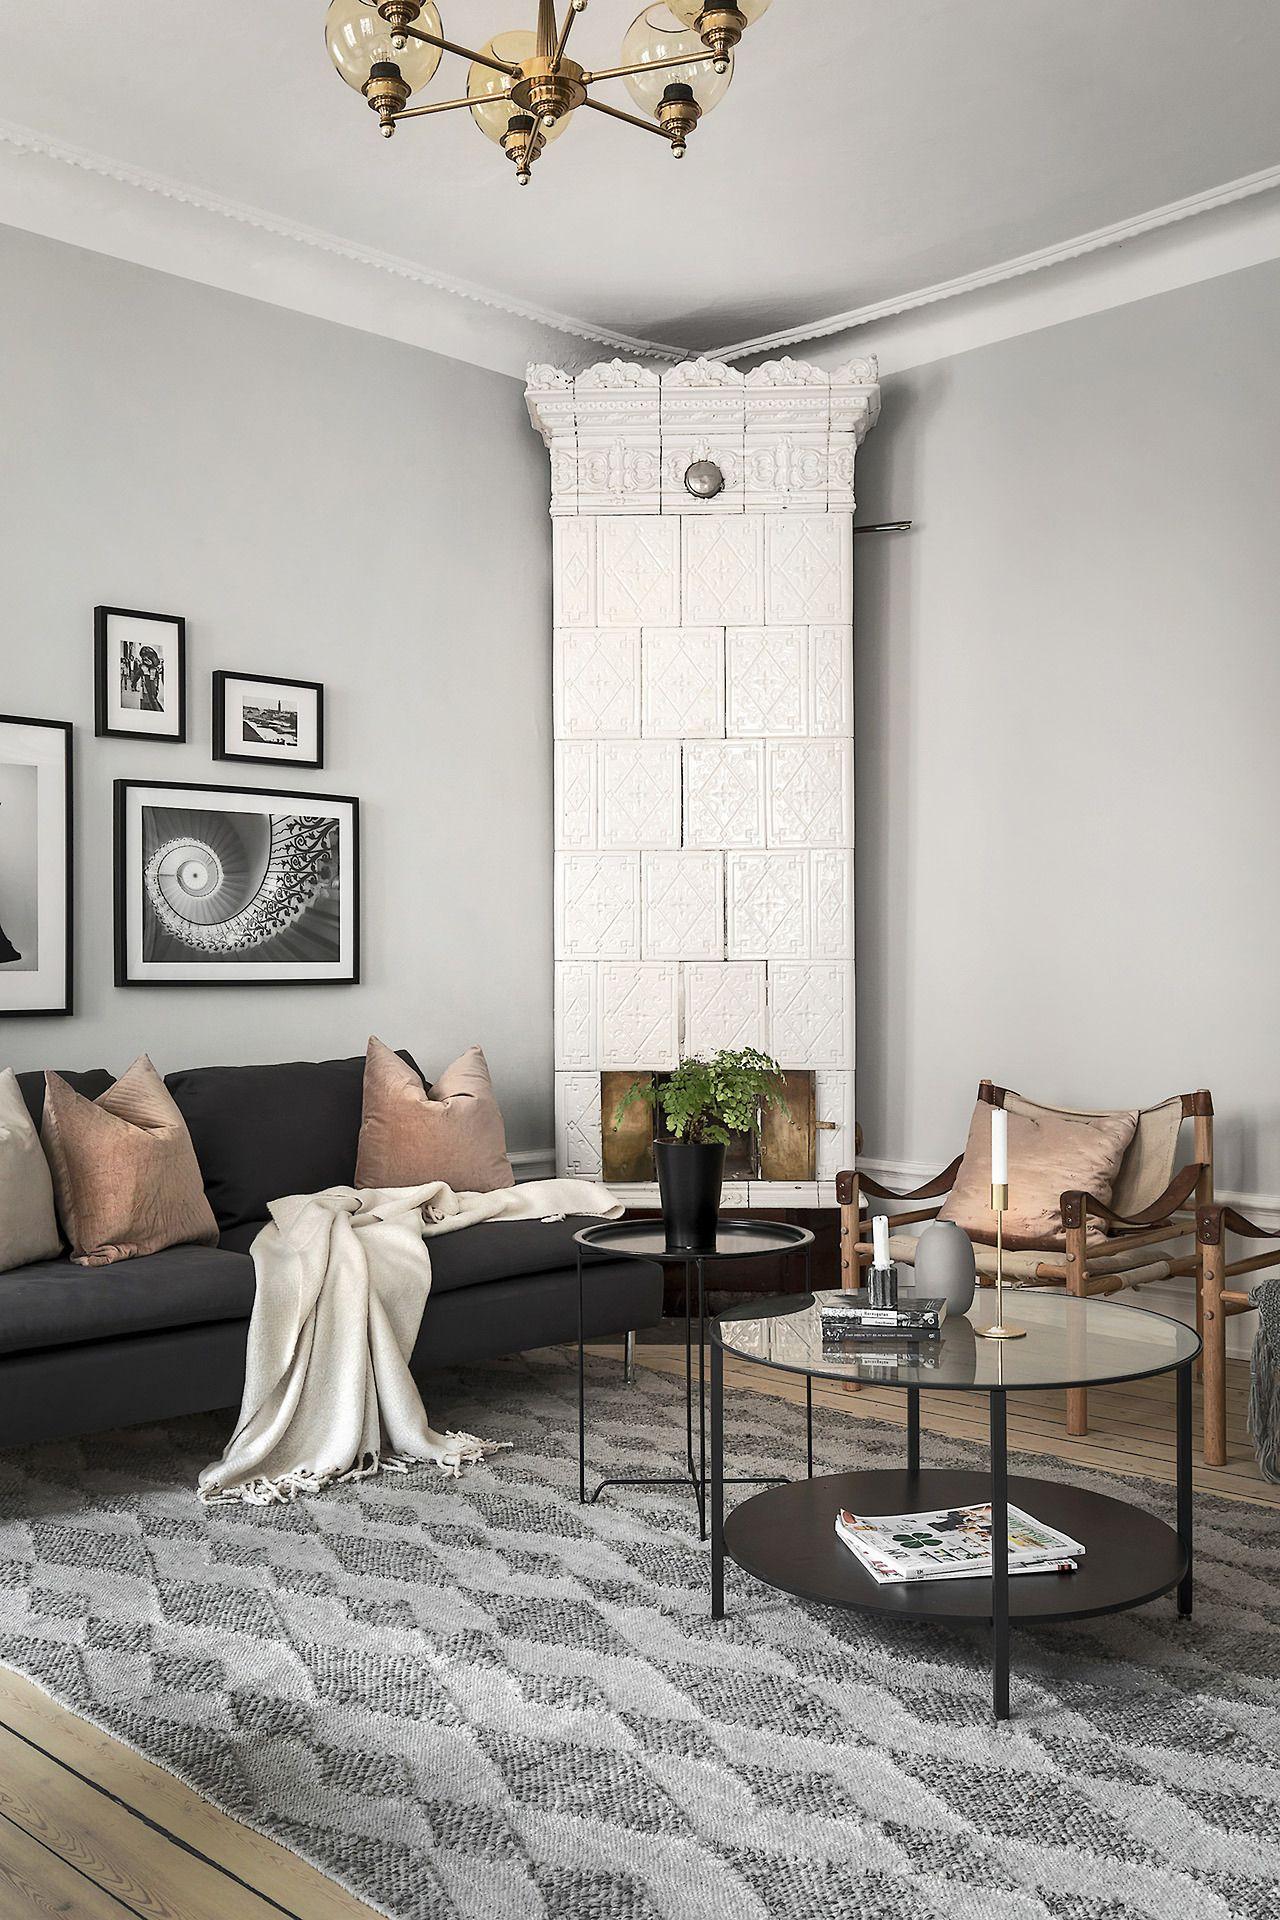 Gravity Home — Scandinavian apartment Follow Gravity Home: Blog ...